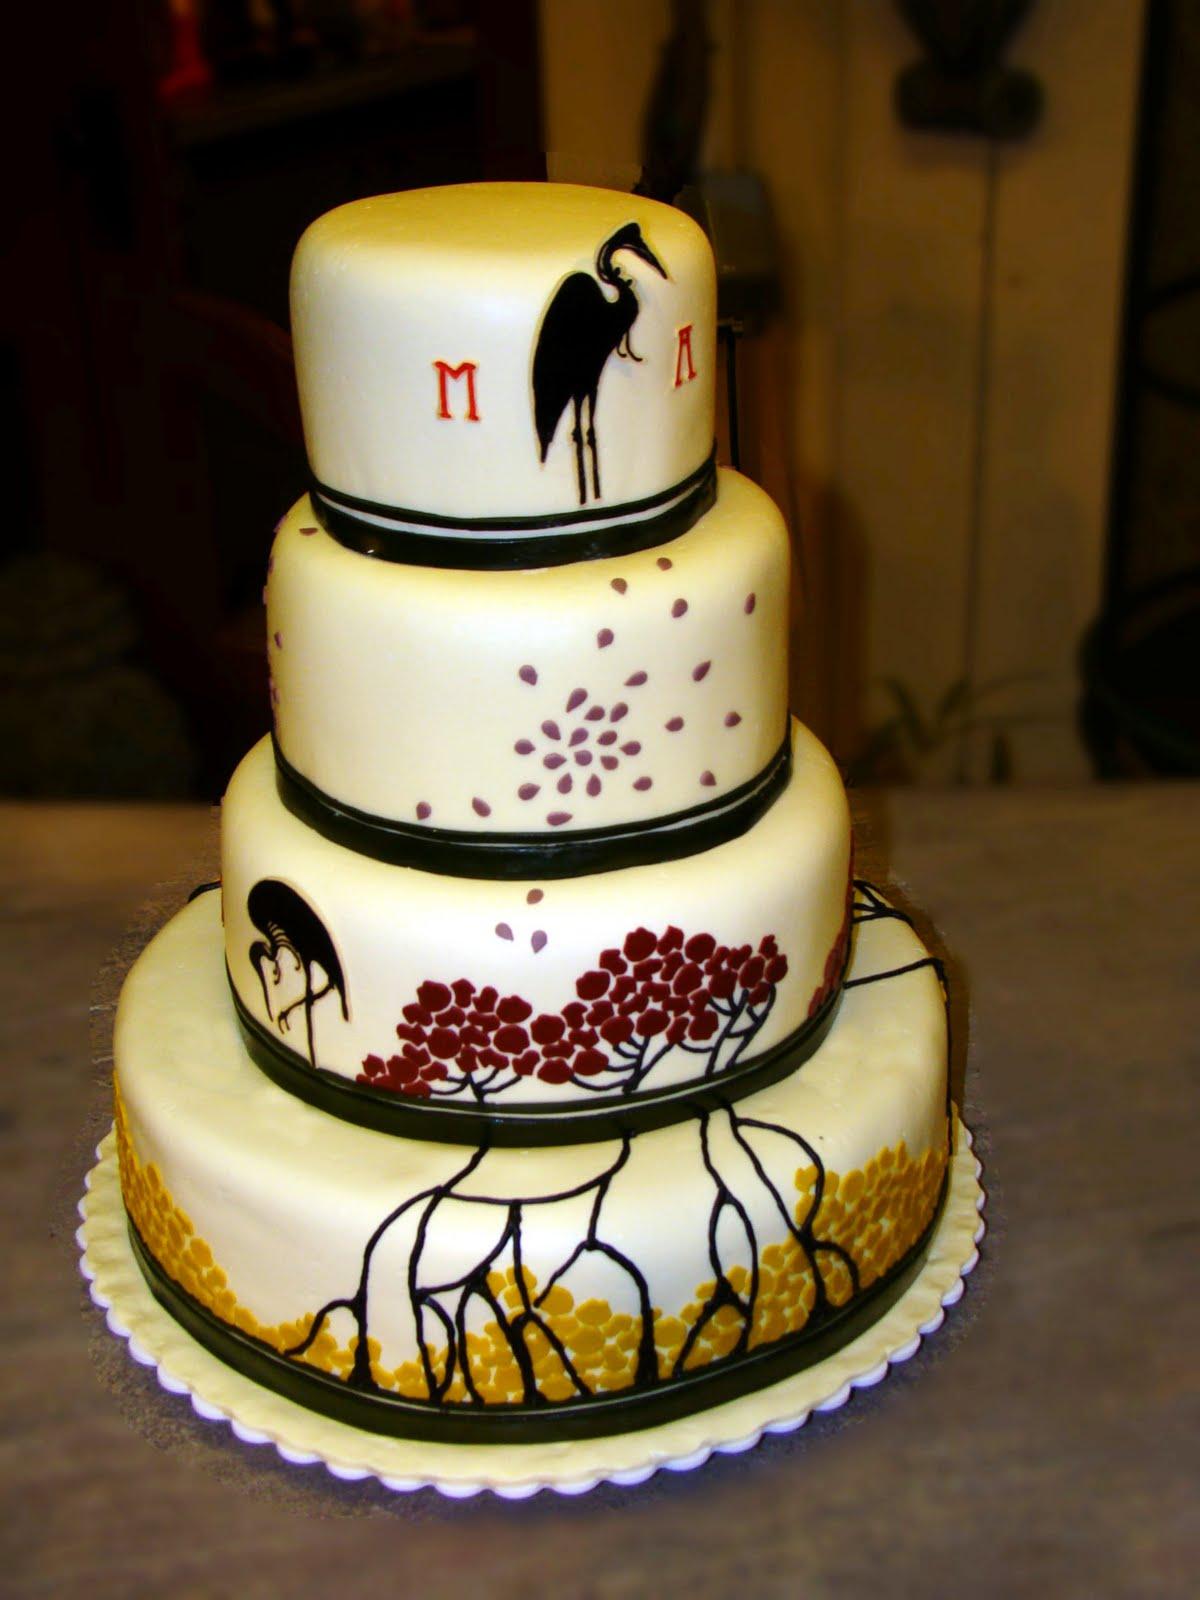 Mosaic Wedding Cake - This was